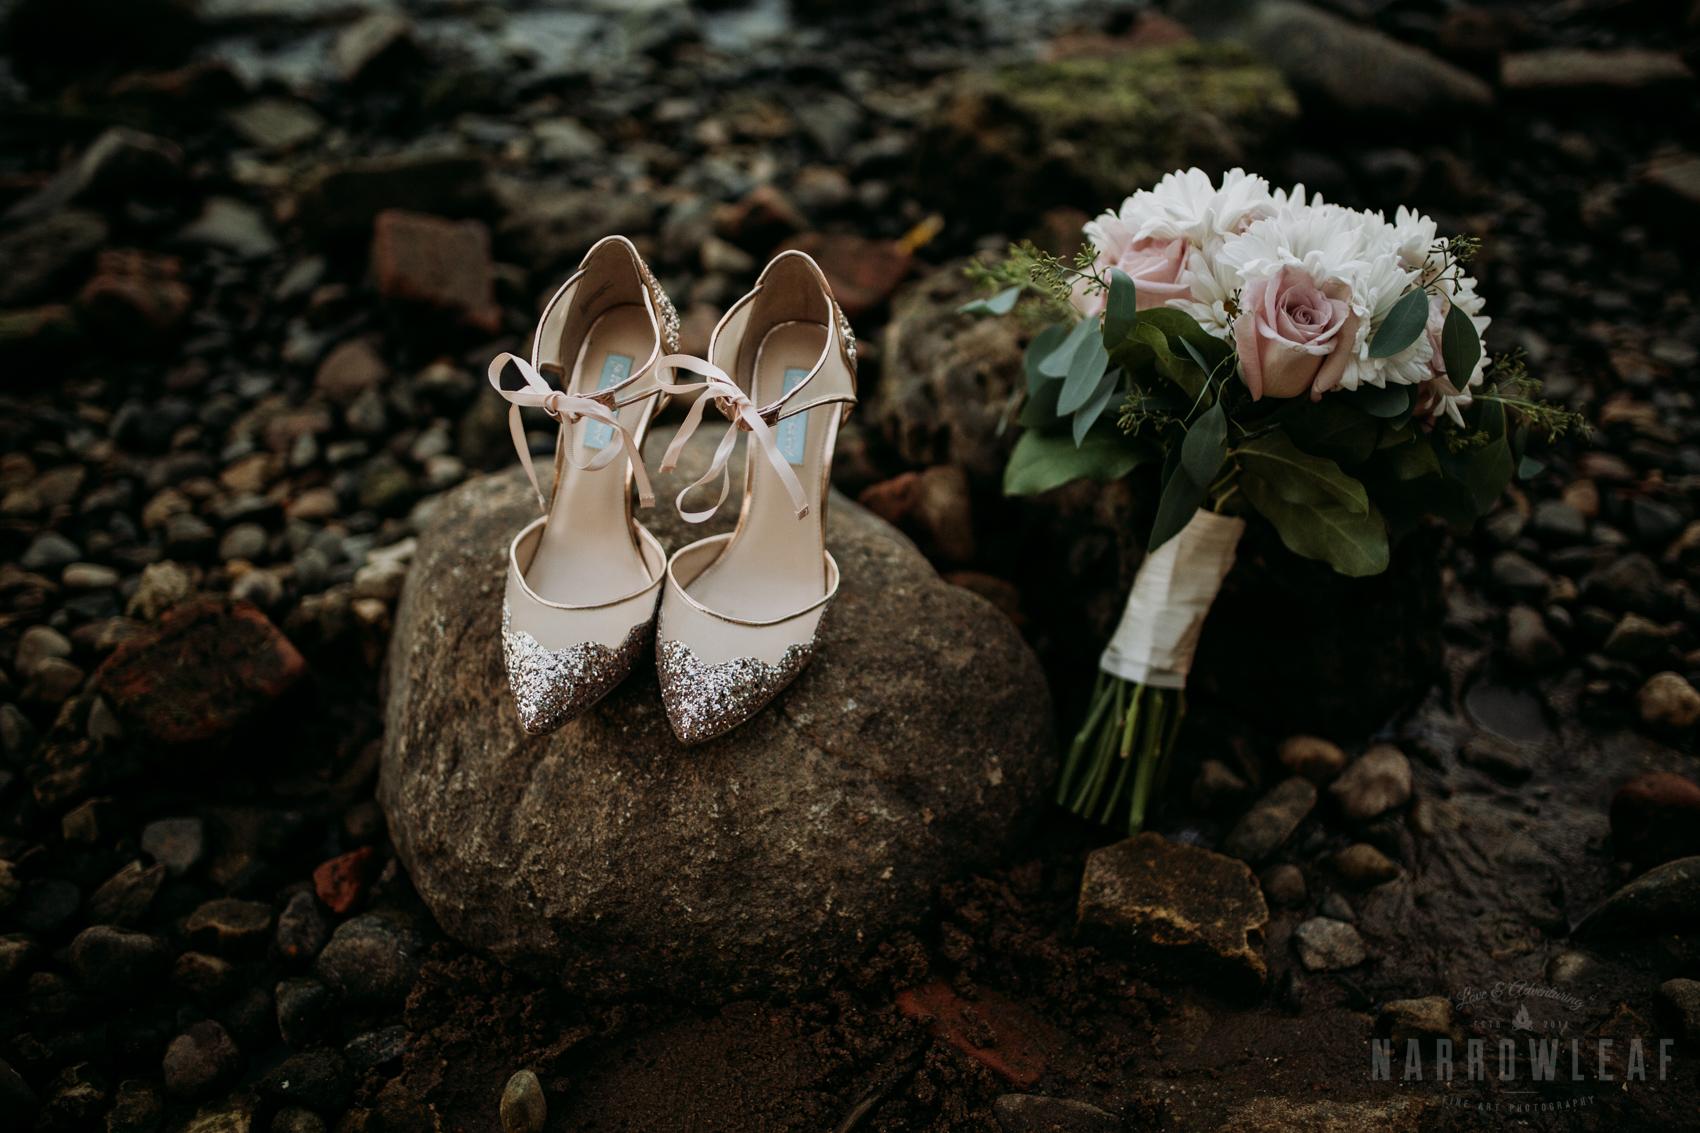 minnesota-outdoor-wedding-elopement-NarrowLeaf_Love_&_Adventure_Photography-32.jpg